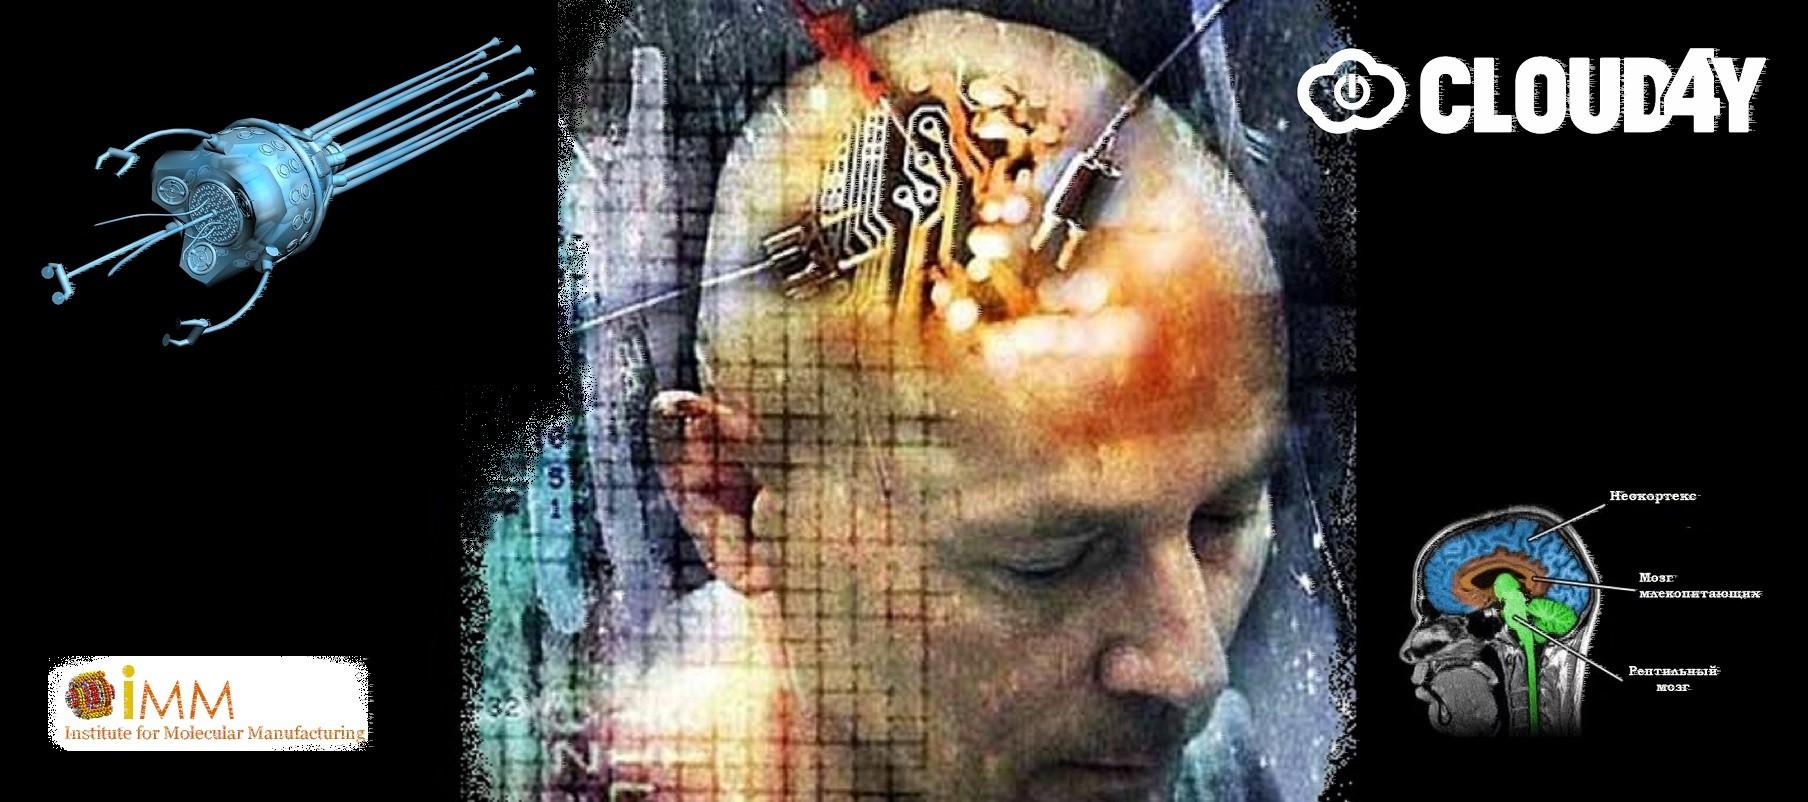 Через «пару десятилетий» мозг подключат к Интернету - 1